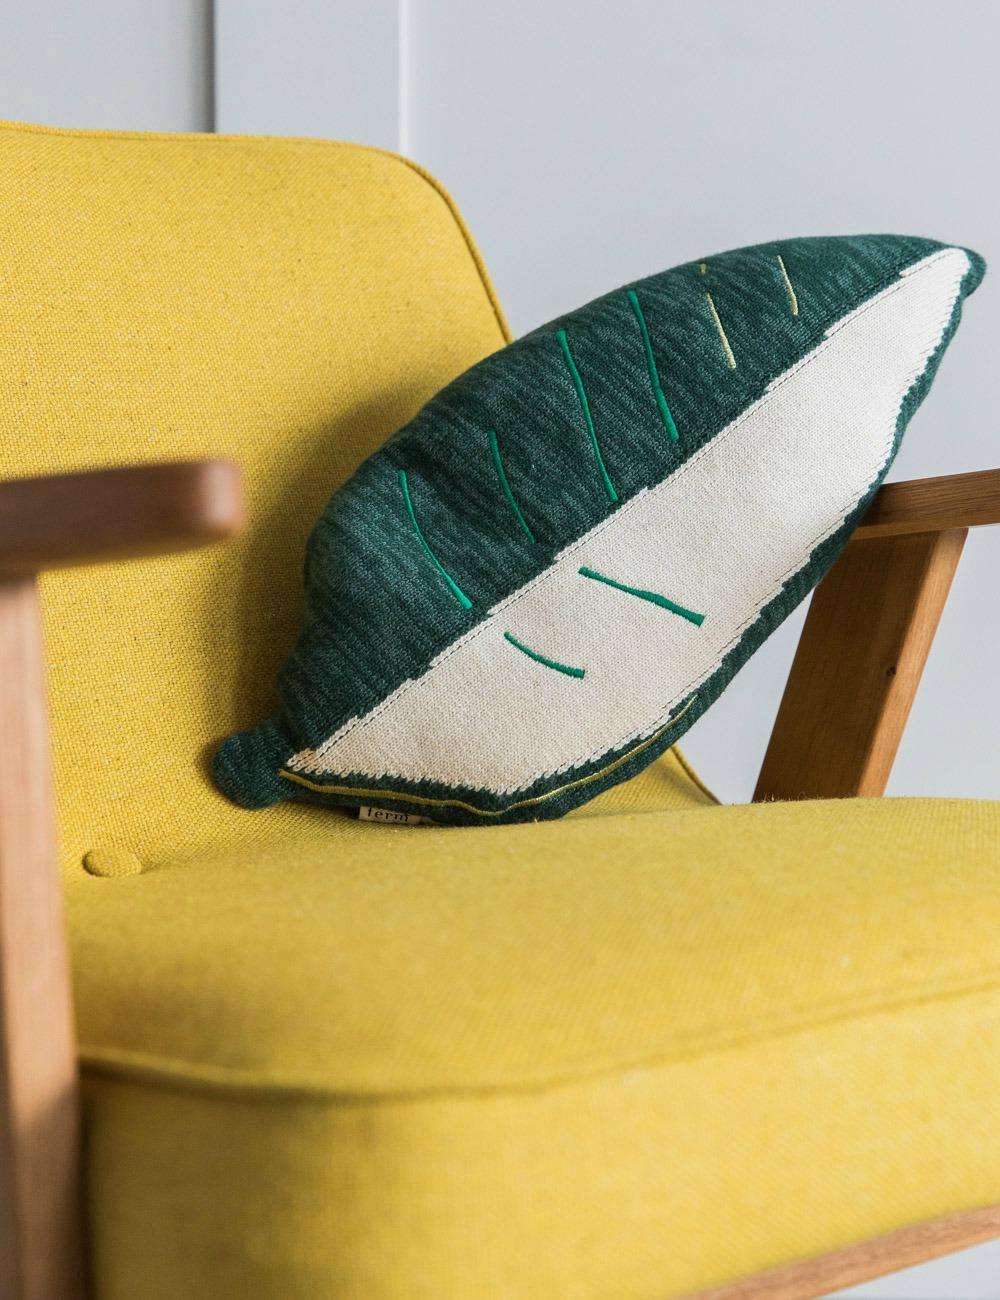 Banana Leaf Toy  Cushion 2 copy.jpg